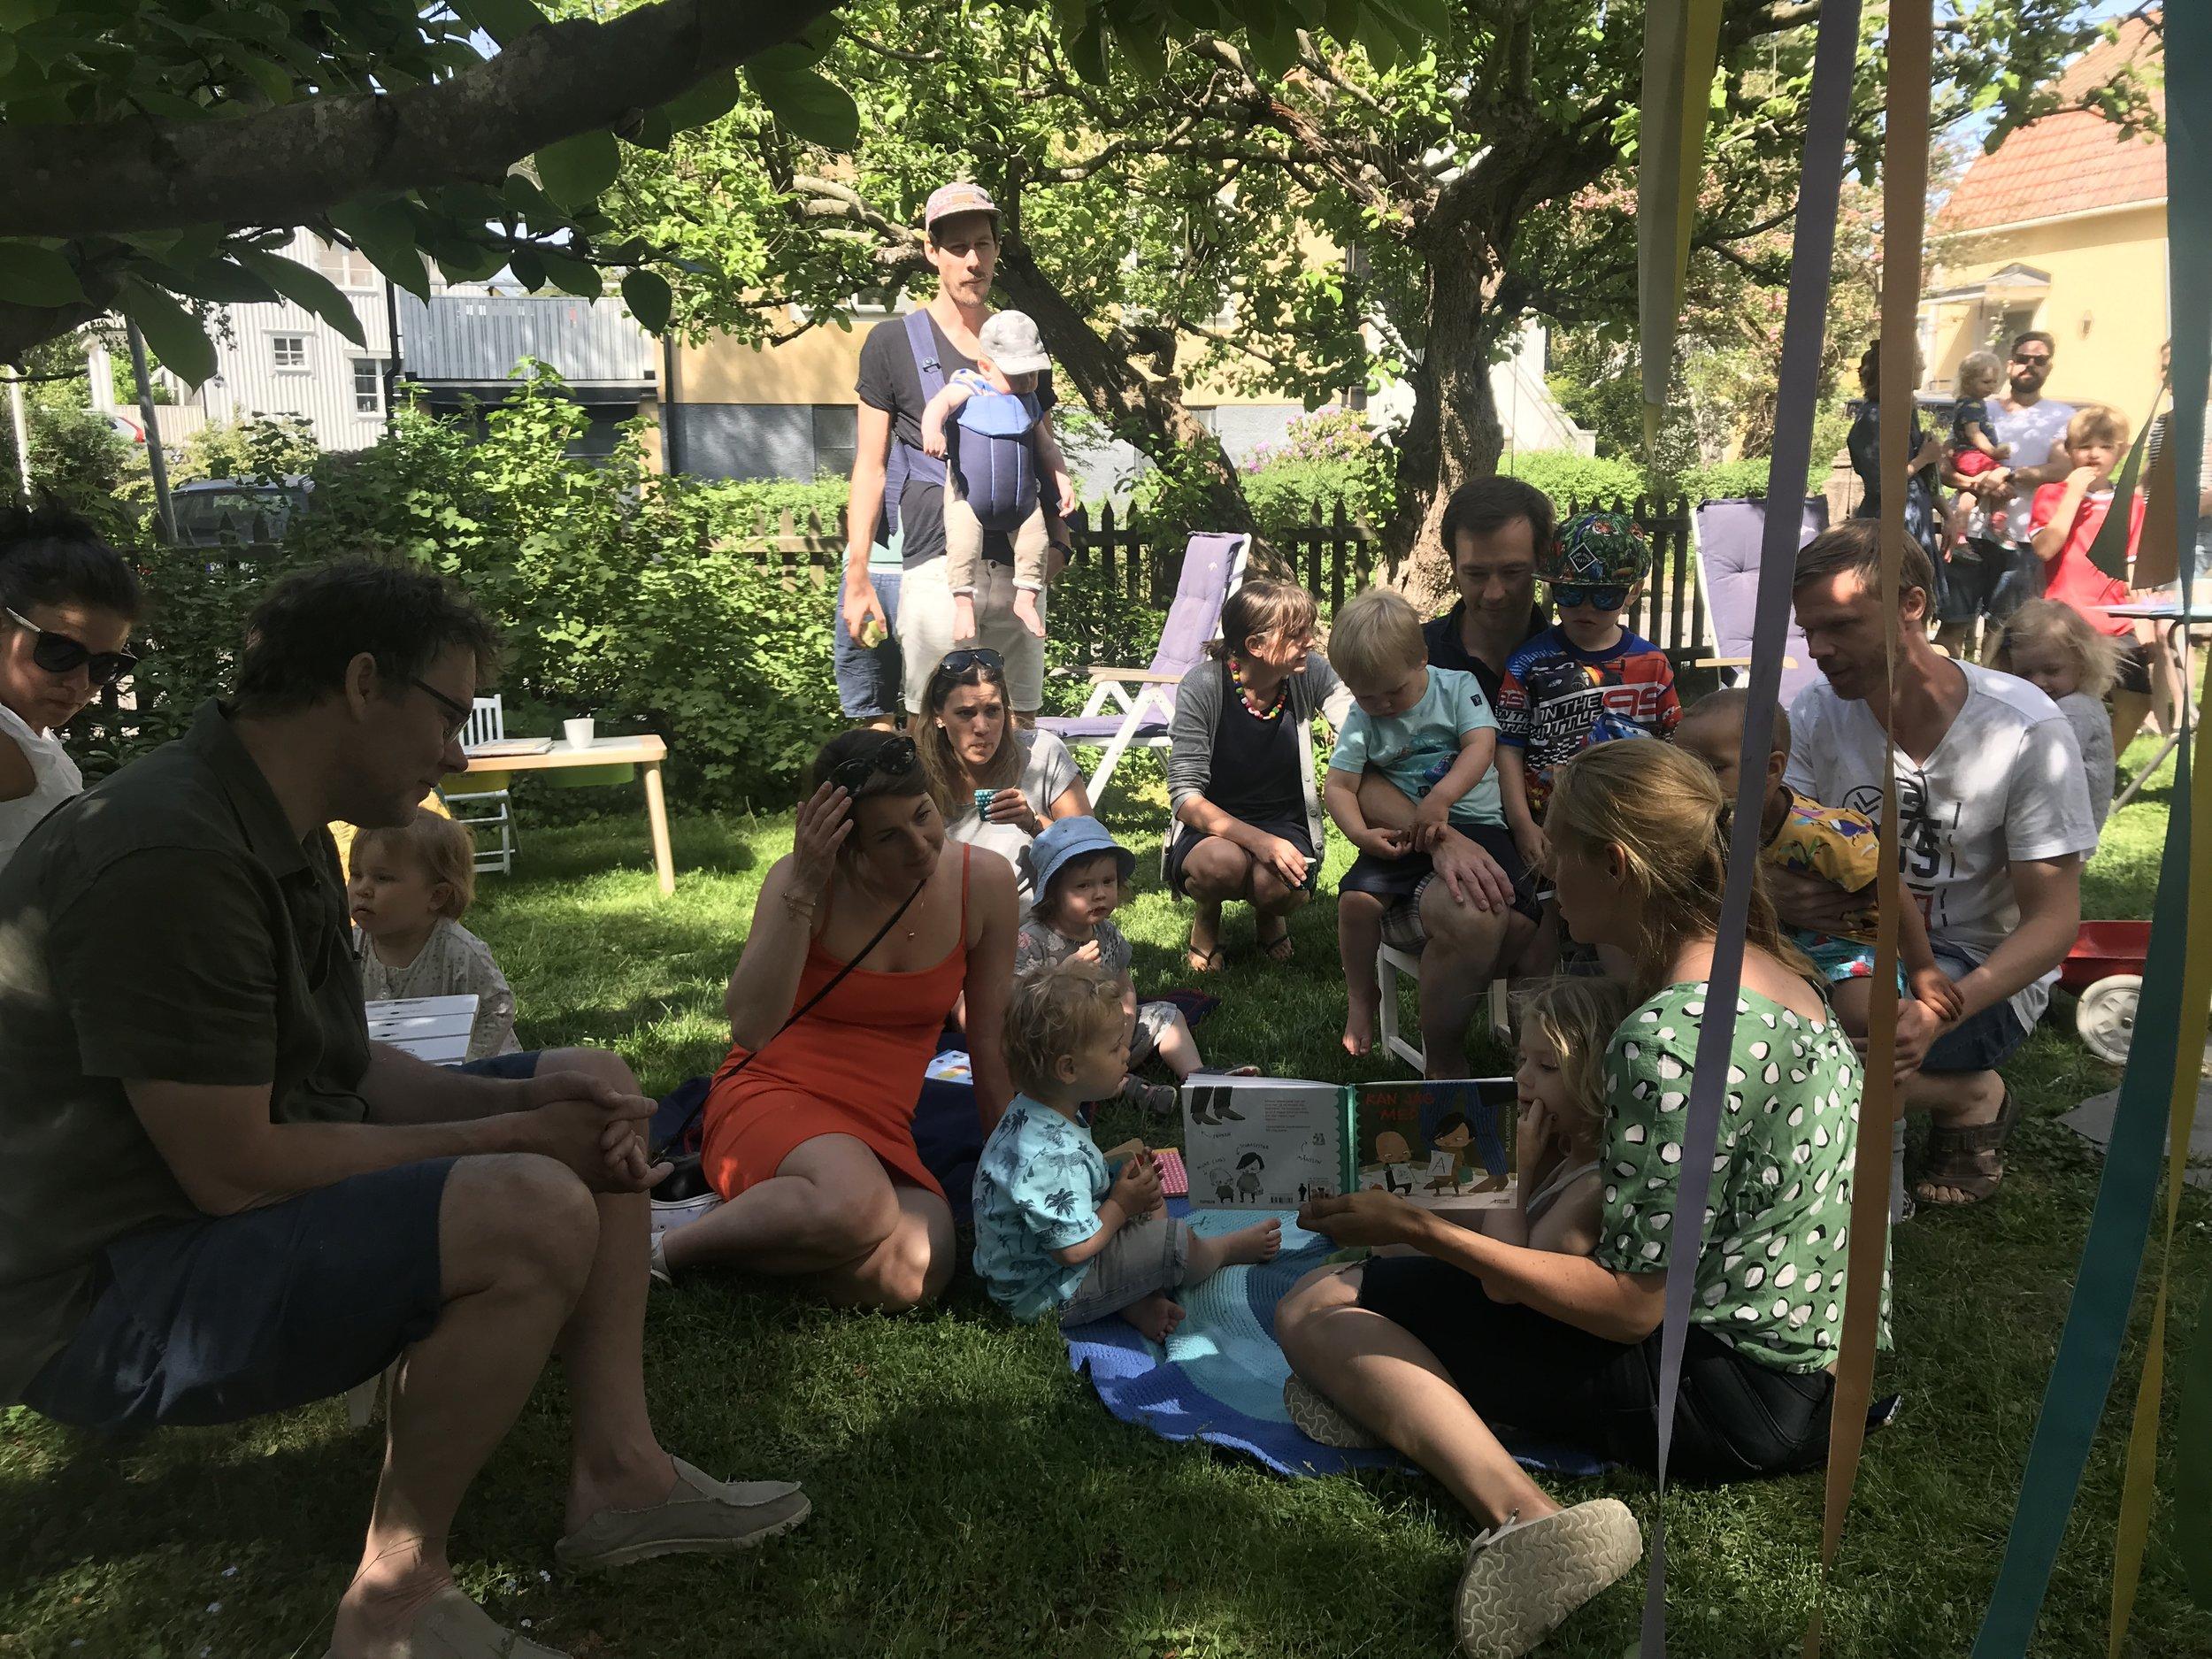 Malin läser Pia Lindenbaum picnic-style